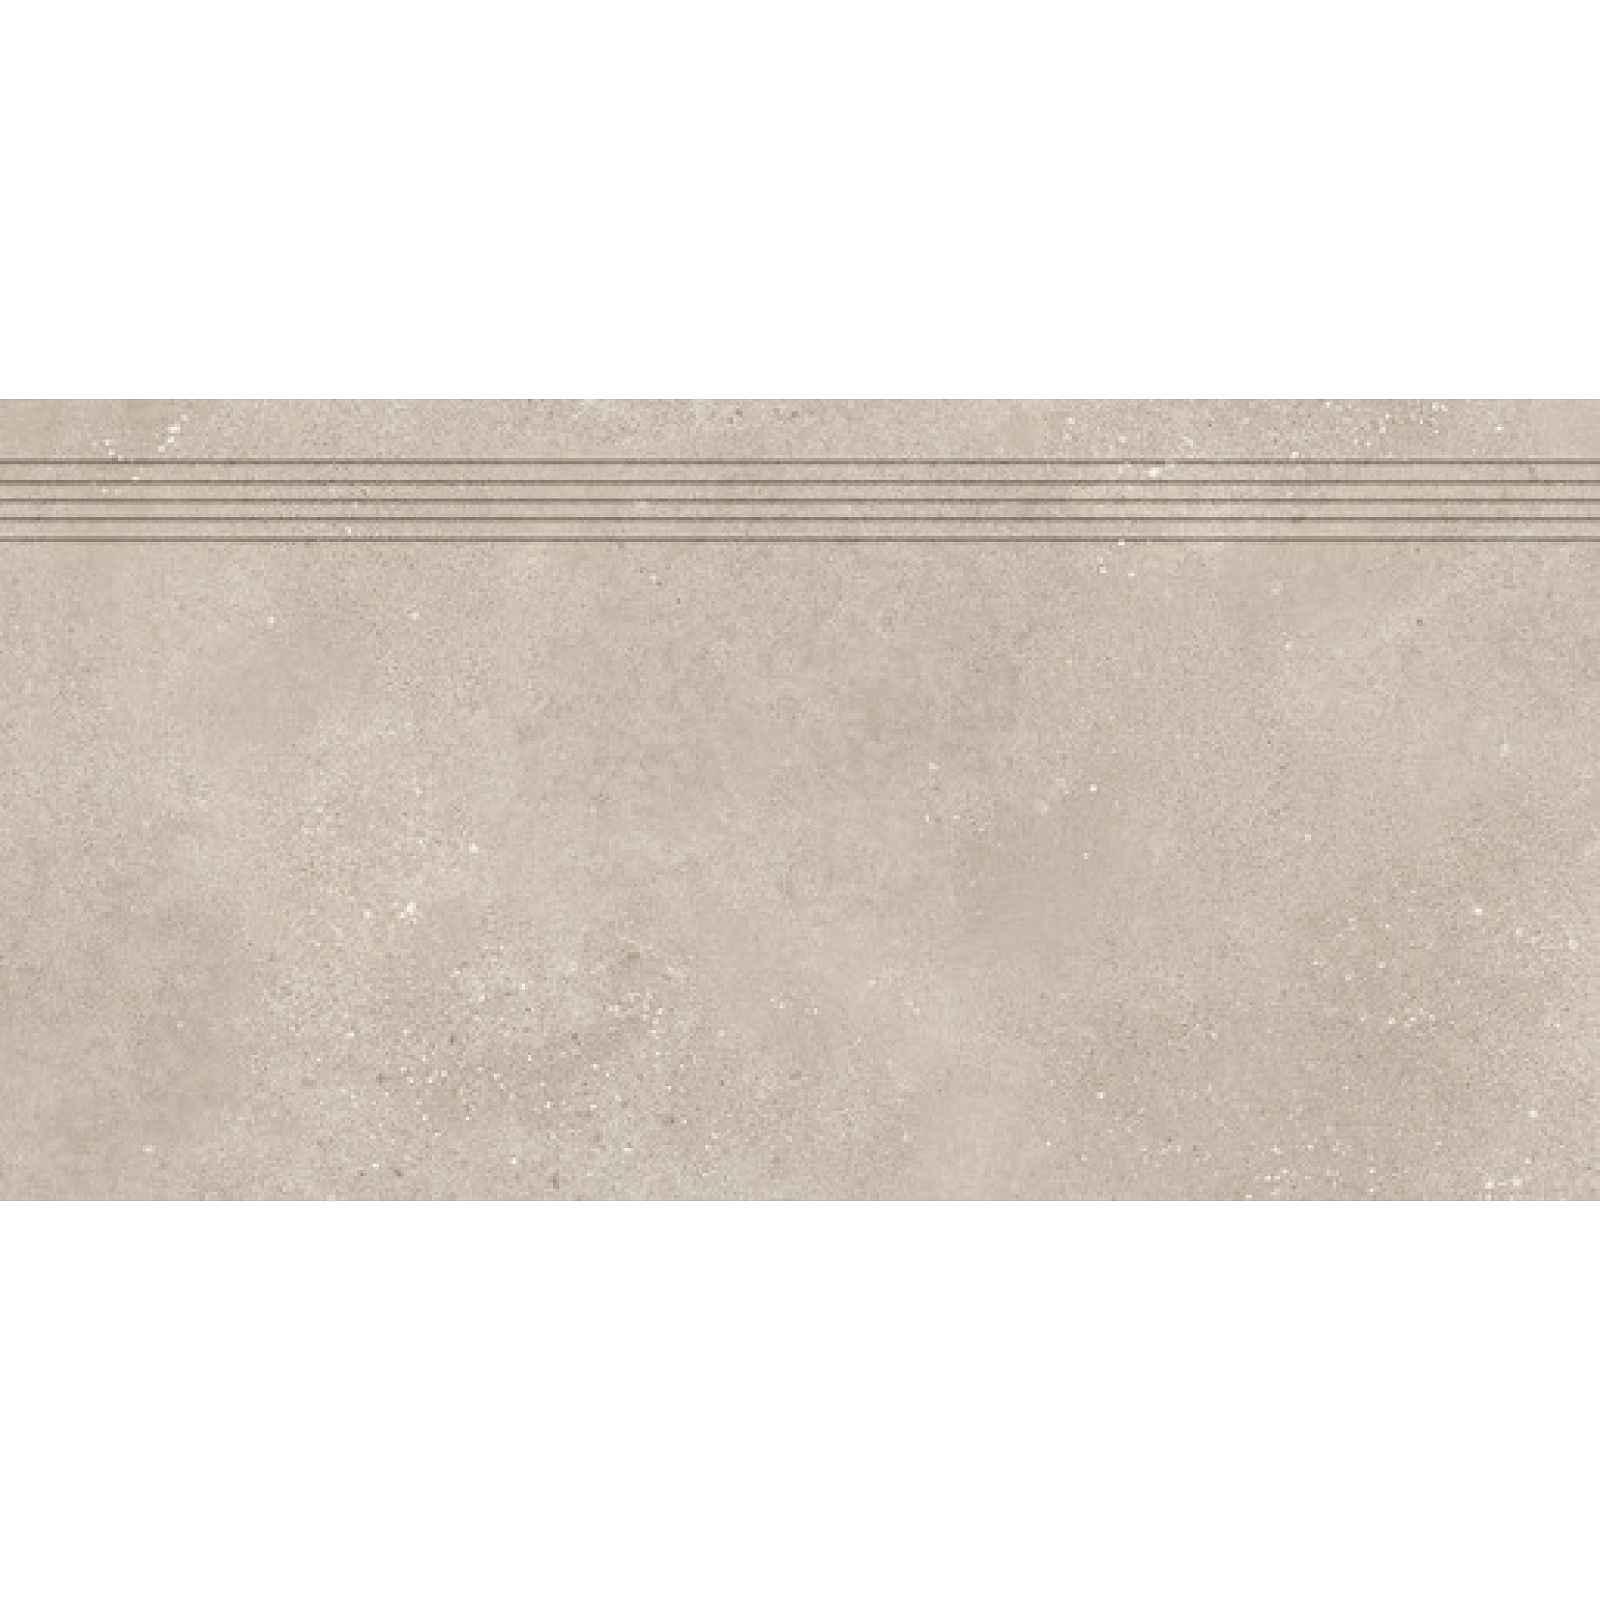 Schodovka RAKO Betonico tmavě béžová 40x80 cm mat DCP84794.1